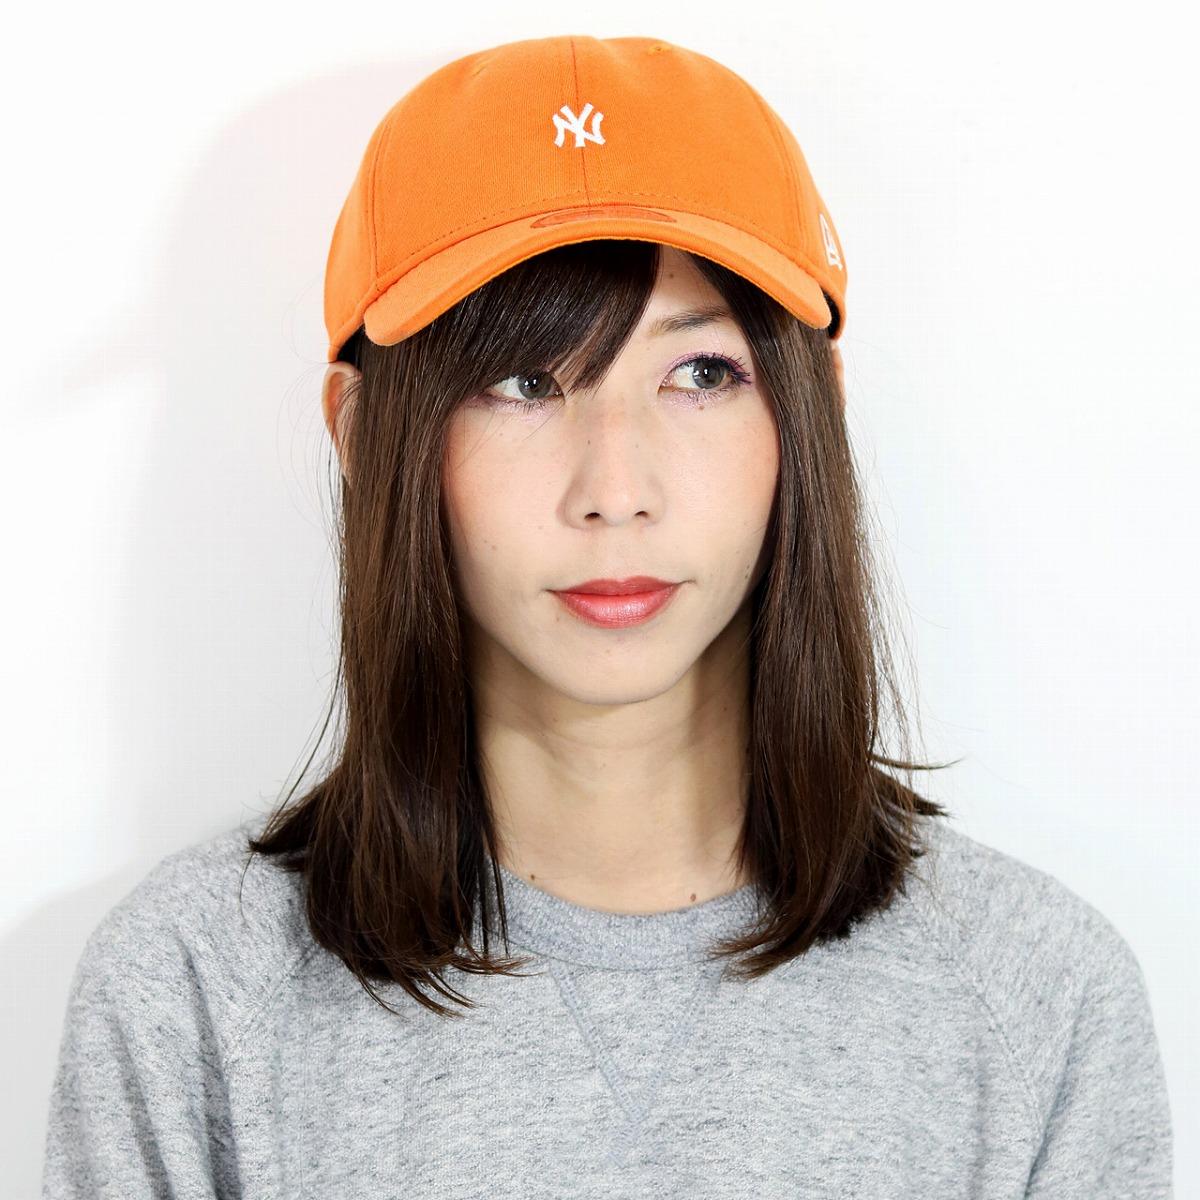 1bf8c8f606d91 Sweat shirt new gills cap hat cap men 9THIRTY hat New York Yankees cap  Lady s sweat shirt men   orange (Christmas gift packing lapping free of  charge) in ...